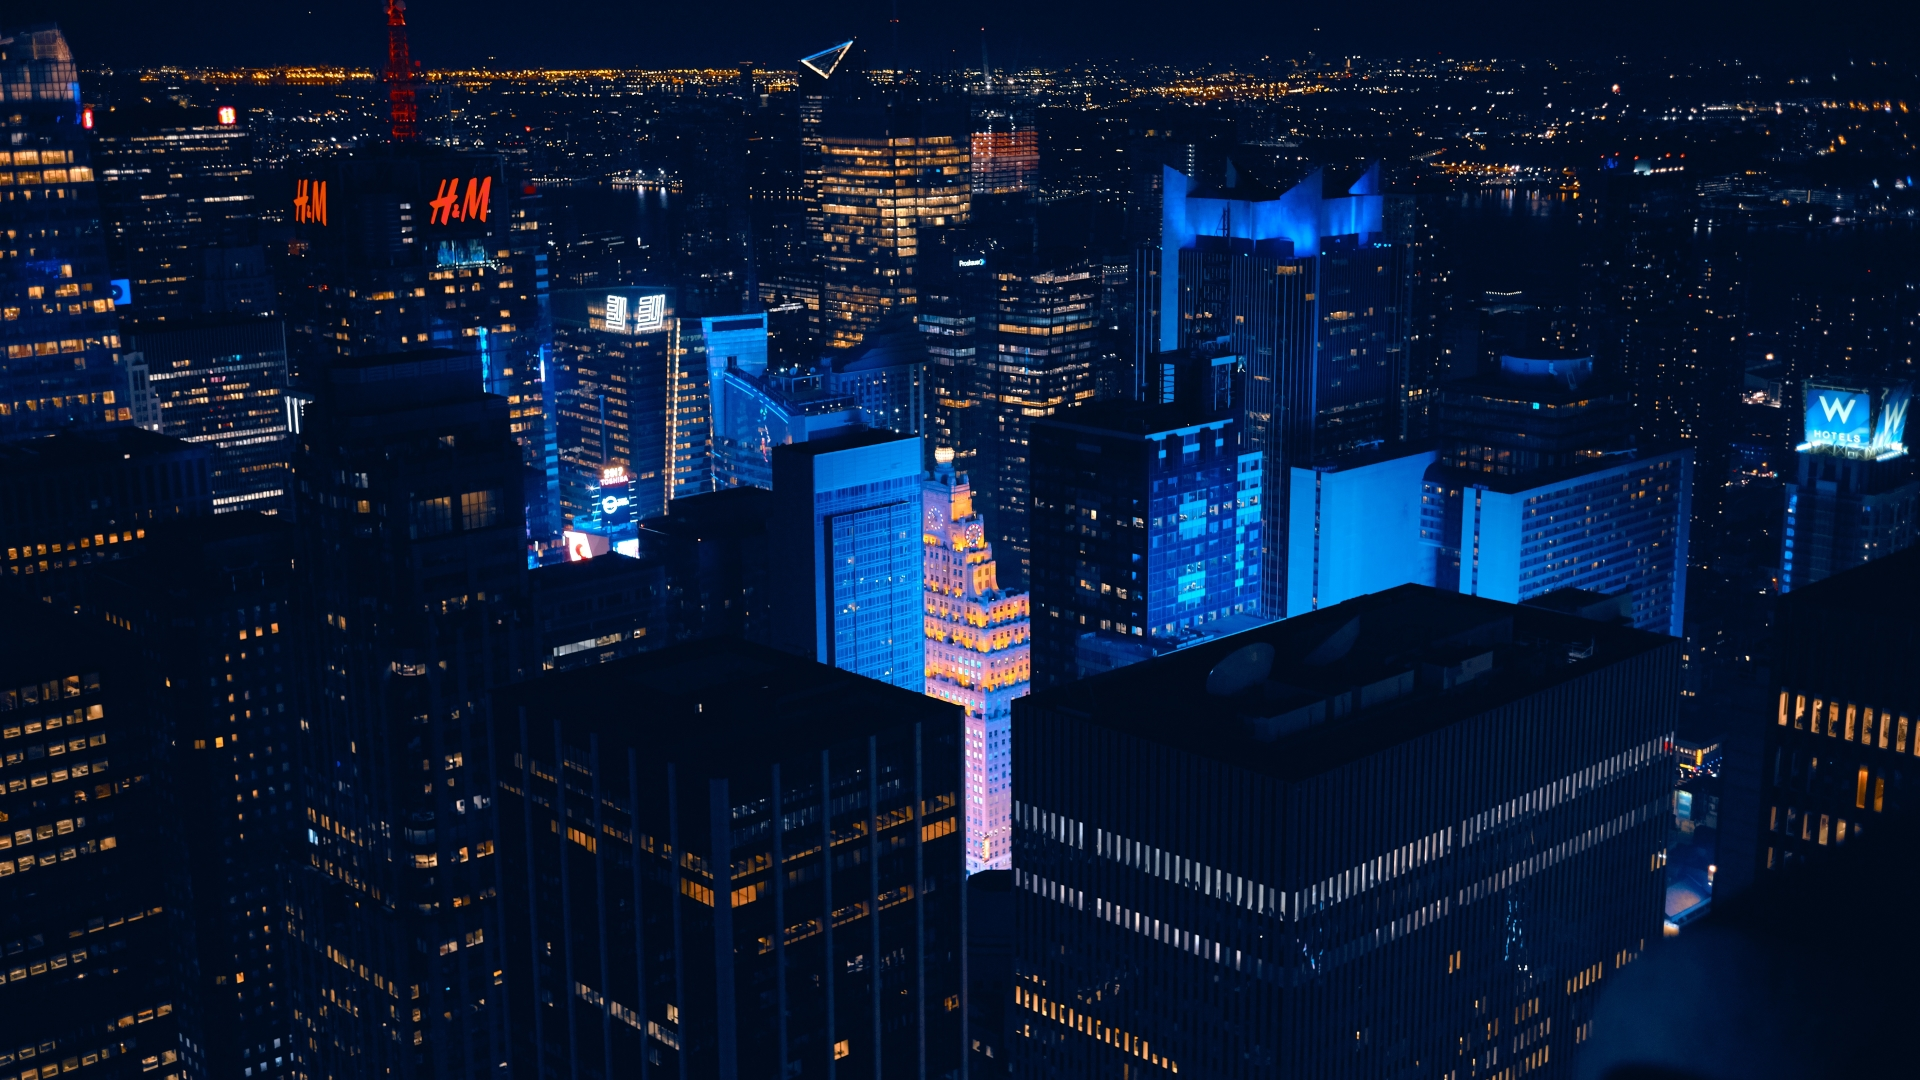 1920x1080 New York Usa Skyscrapers 1080p Laptop Full Hd